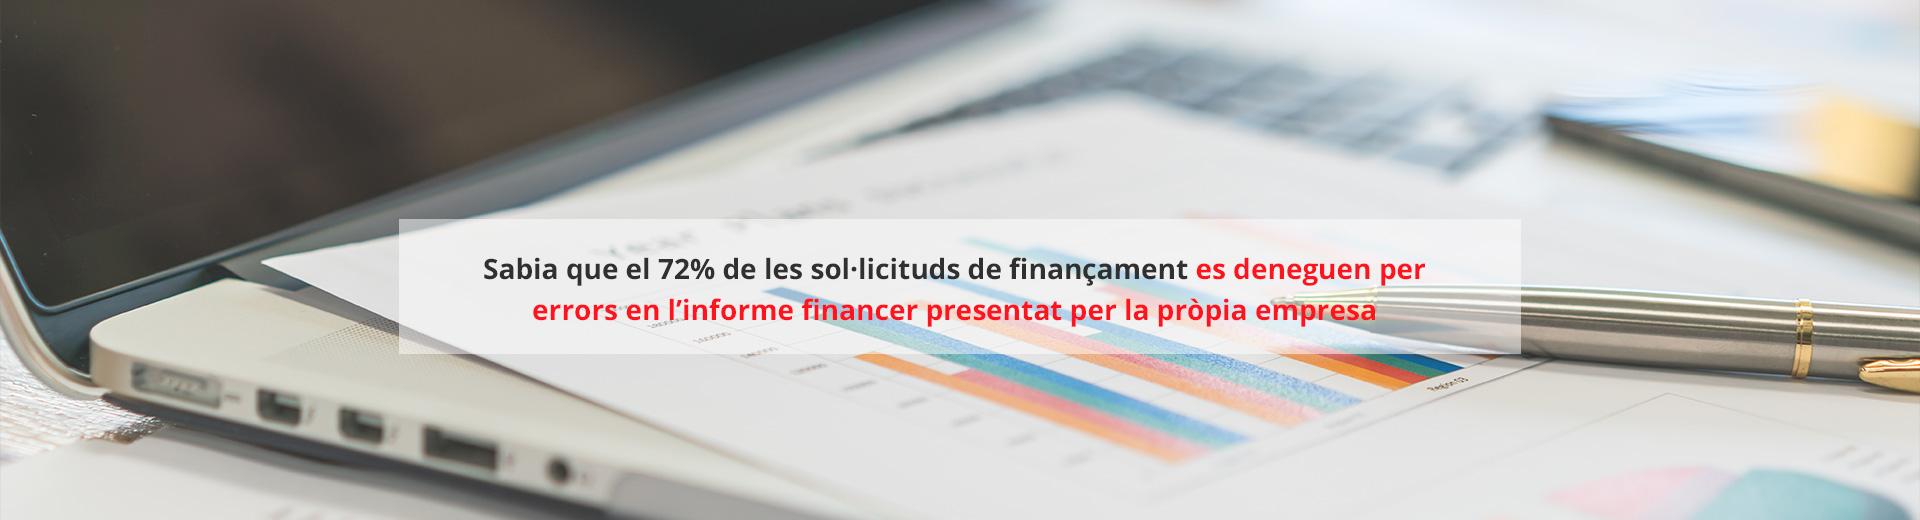 Sol·licitud de finançament - Informe financer